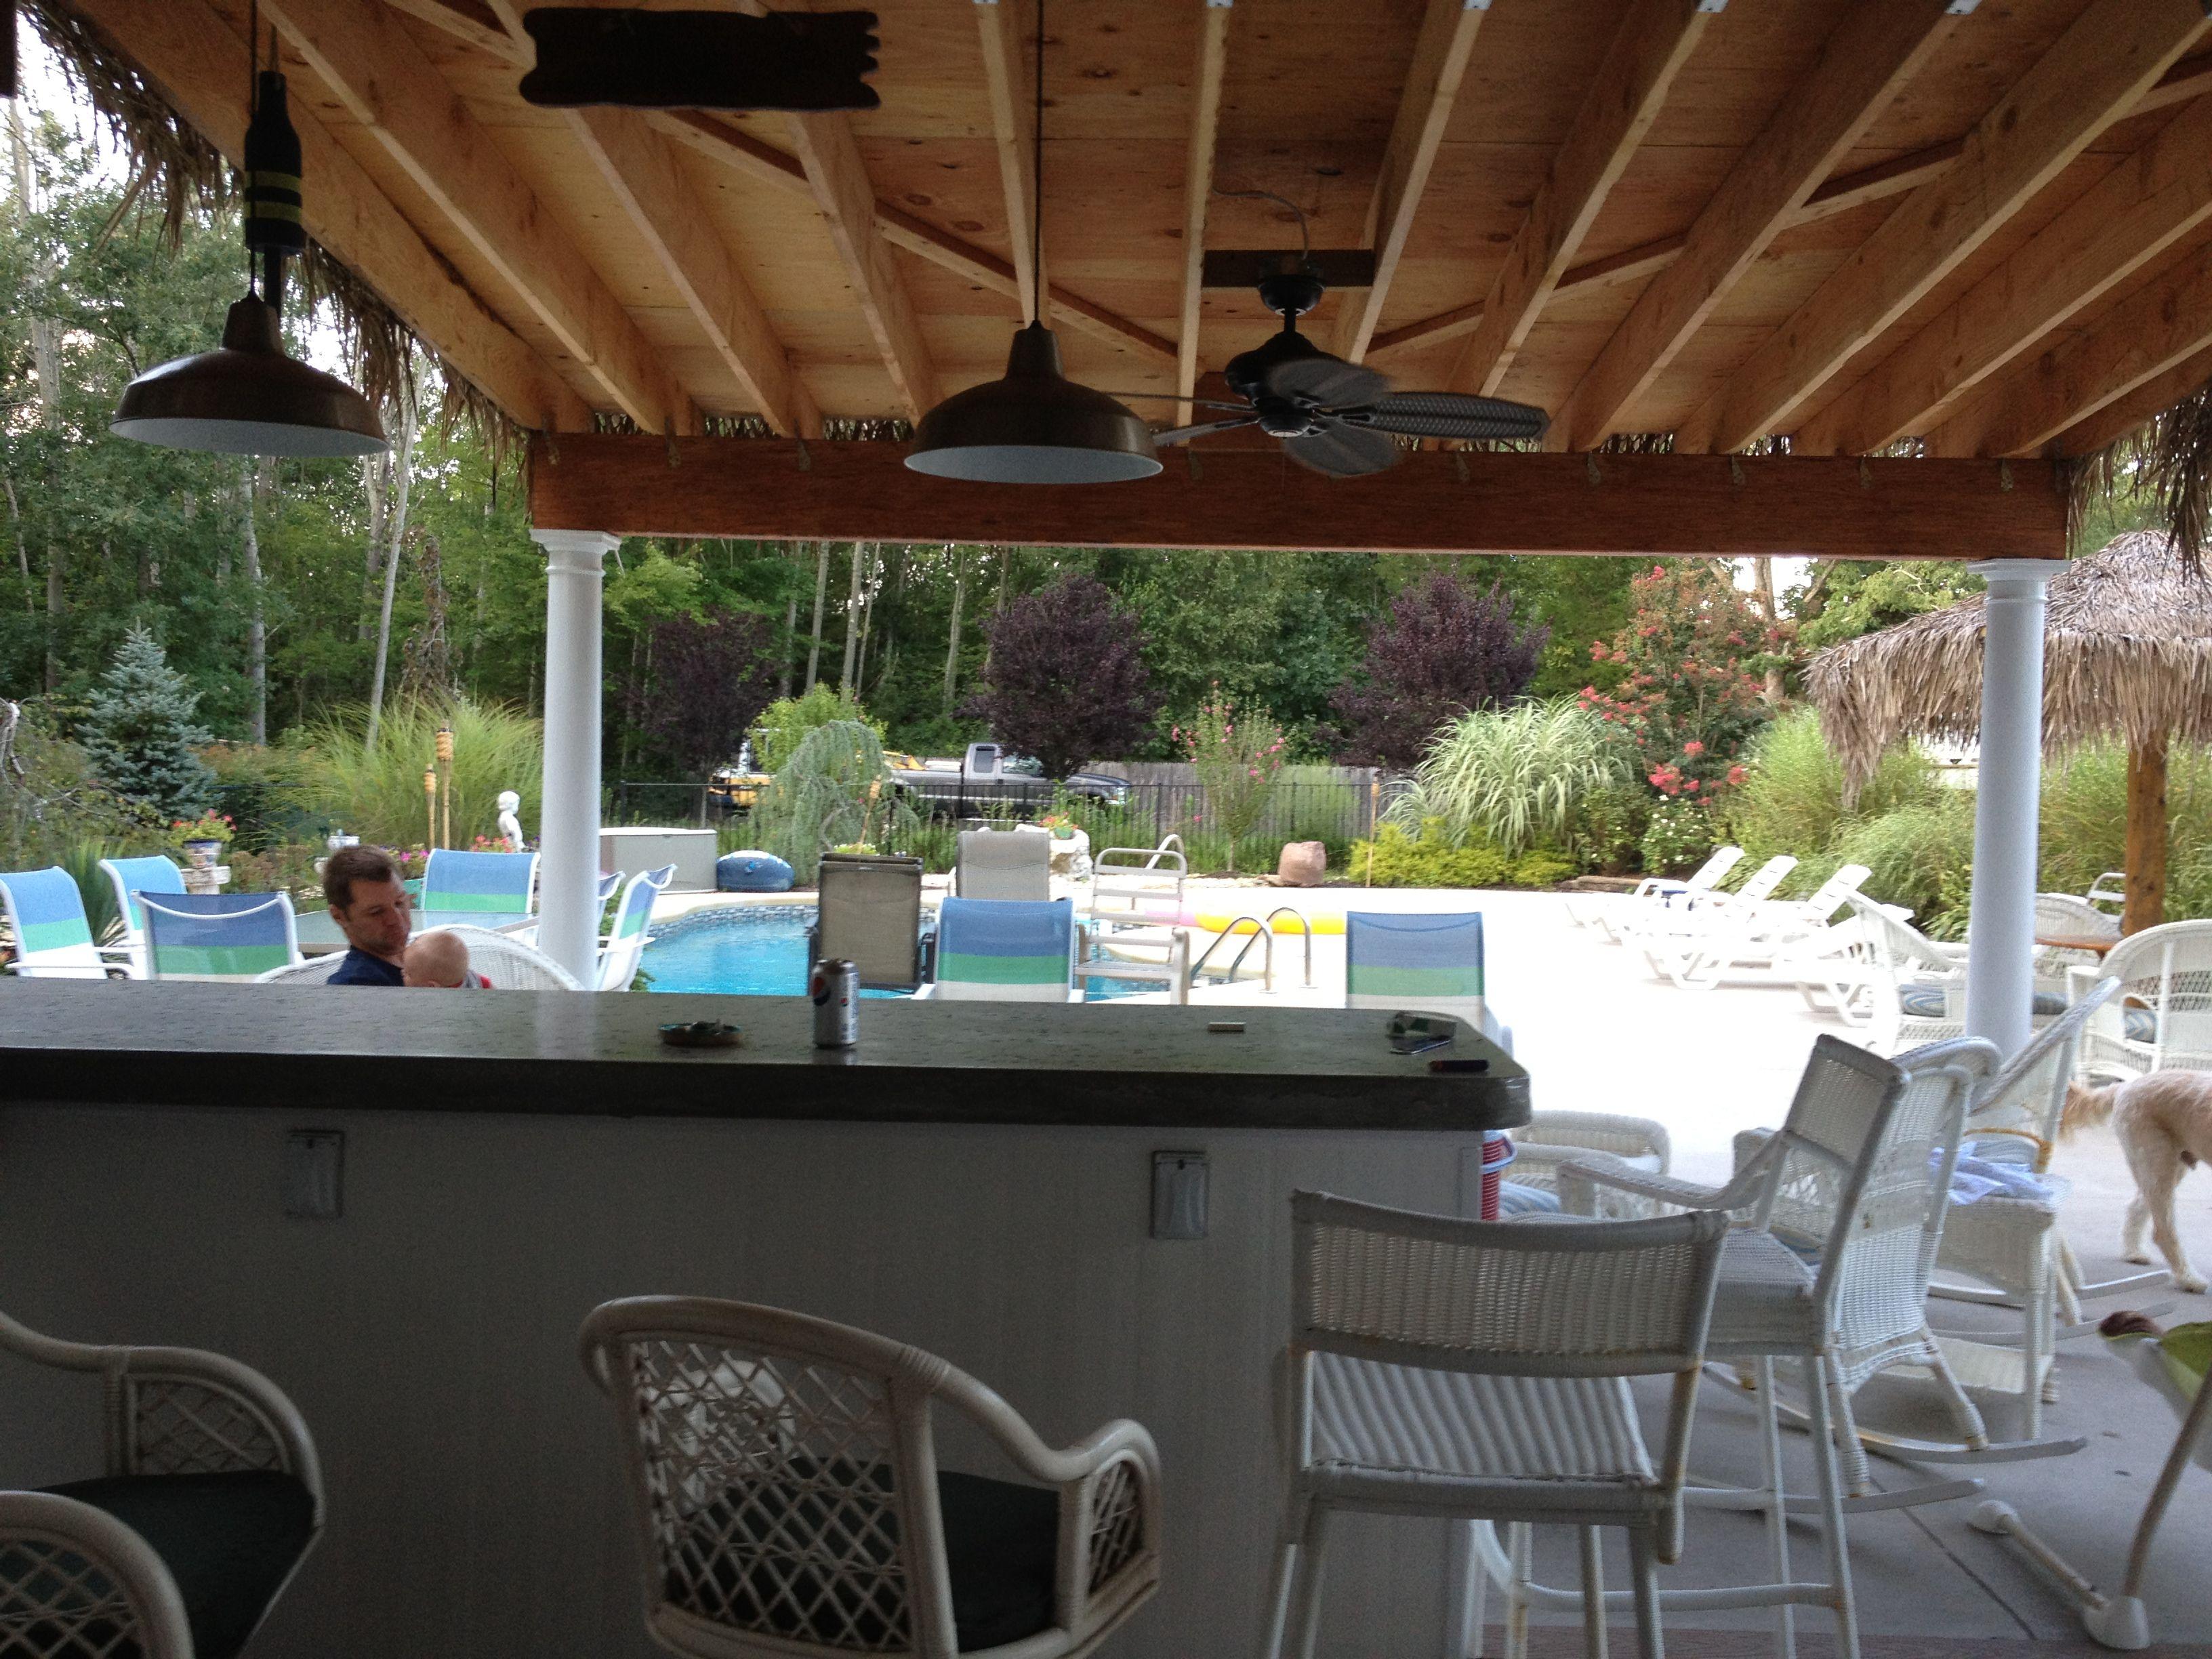 tiki hut overhang roof tiki hut pool house beach house